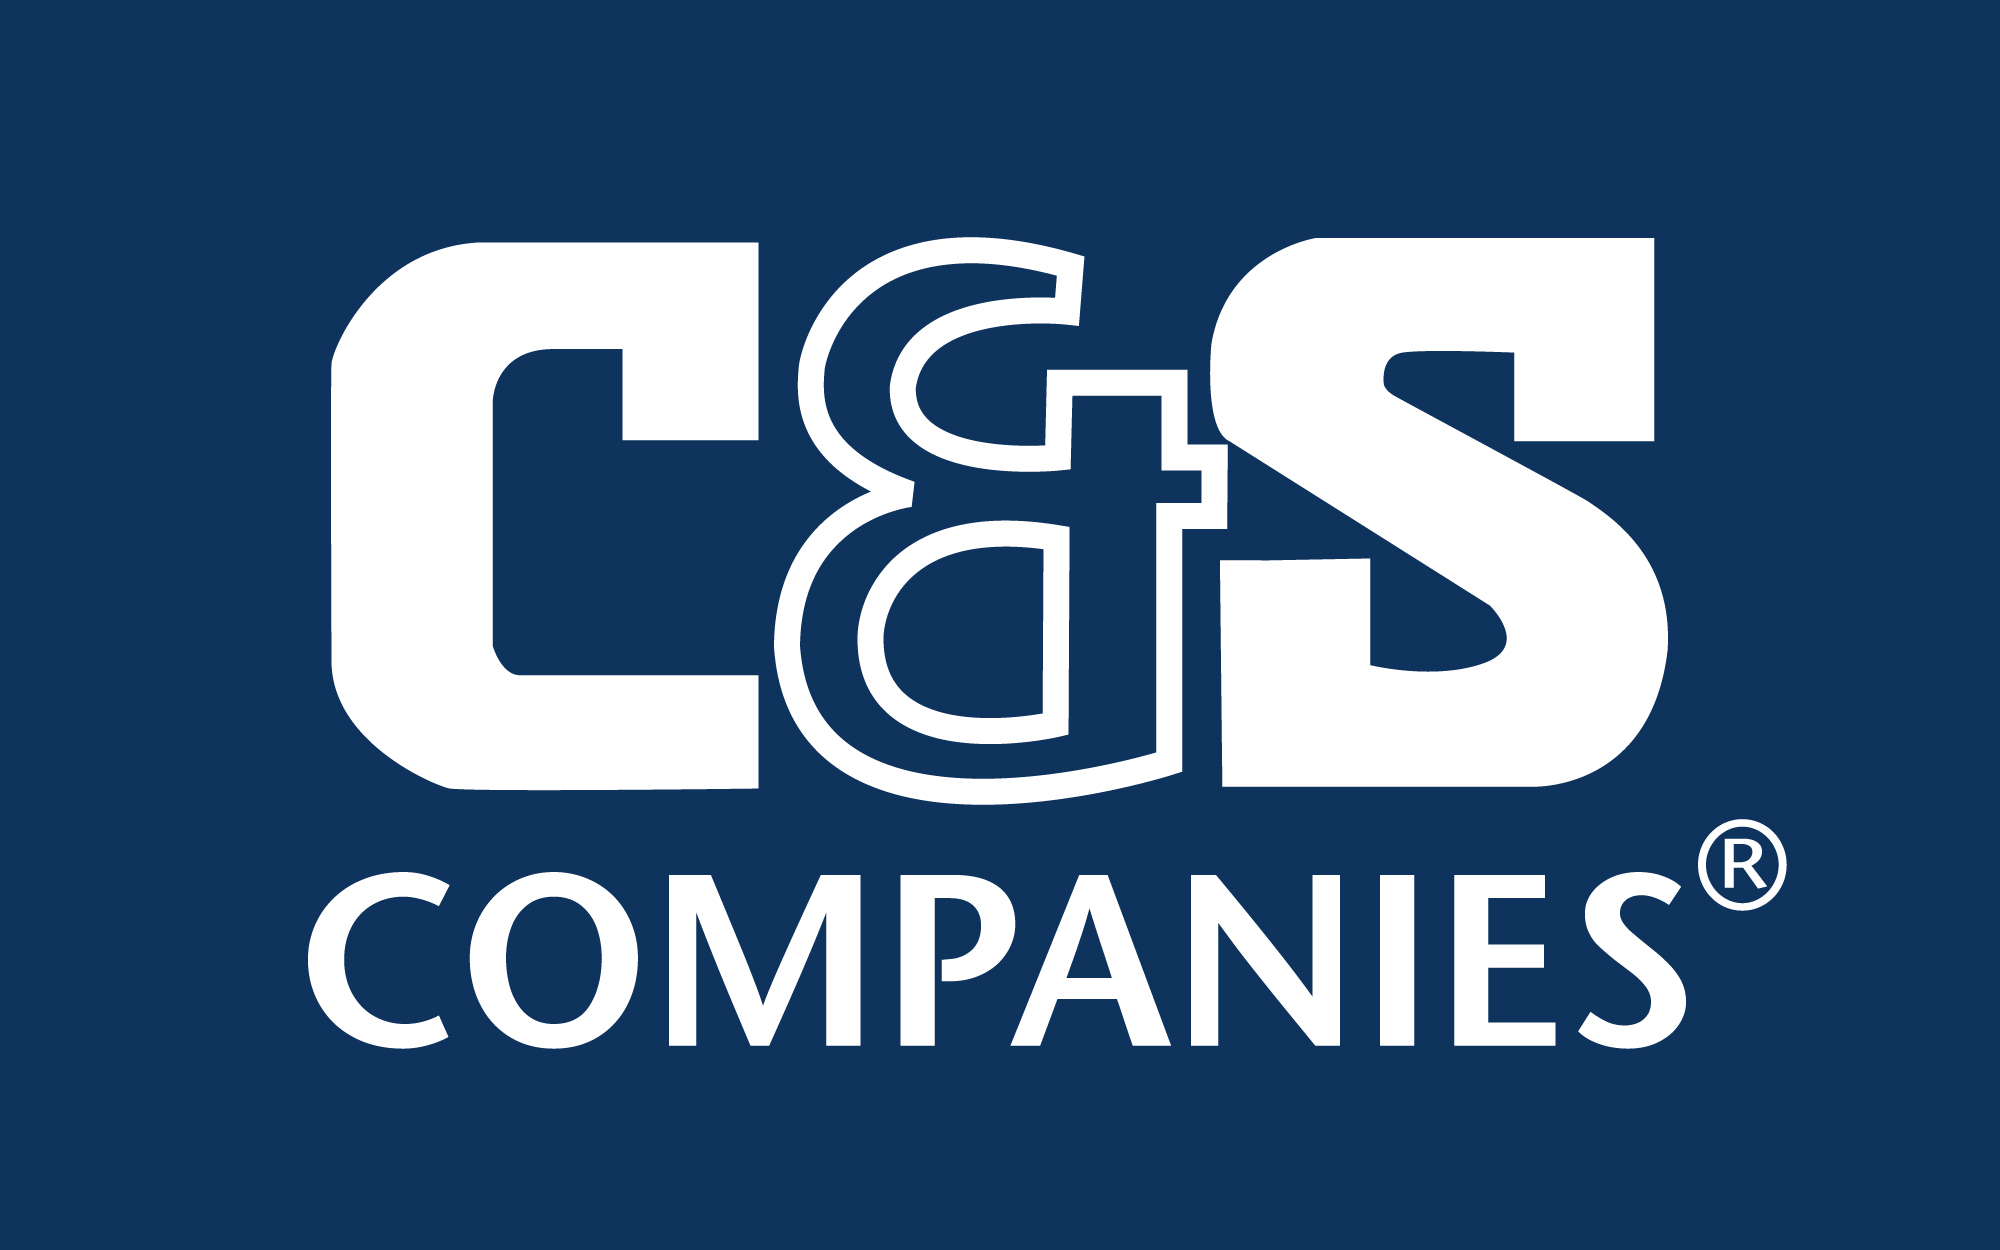 C&S Companies 10-inch.jpg